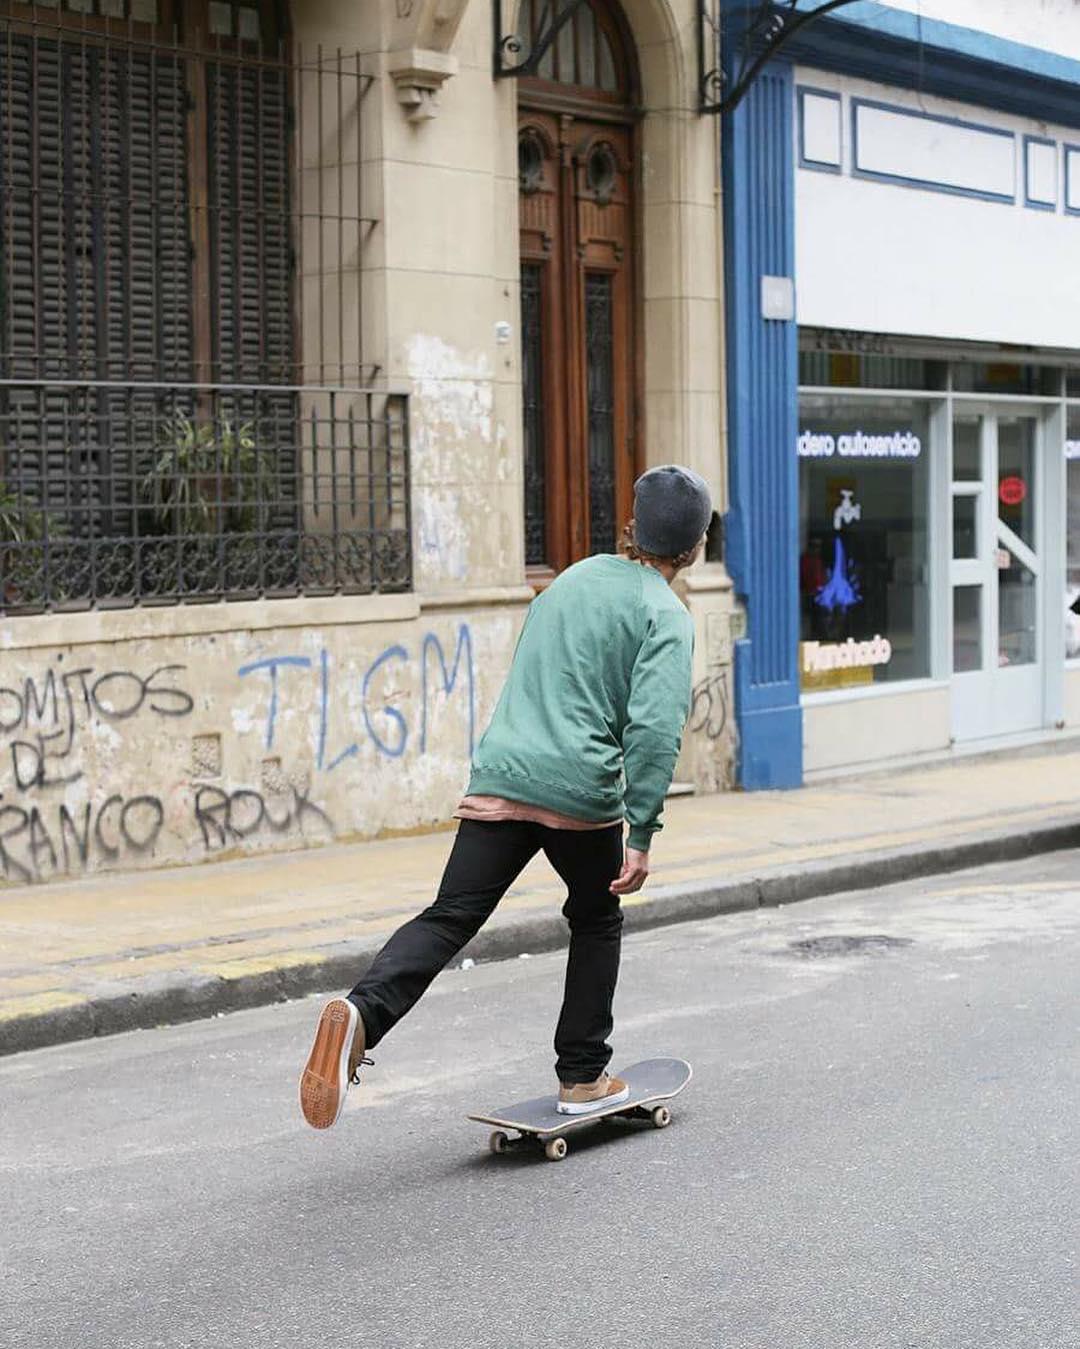 Unas pateadas por las calles de San Telmo #SpiralShoes #TeamSpiral #Skateboarding #Skateordie #Skatestyle #Skatelife #Goskate